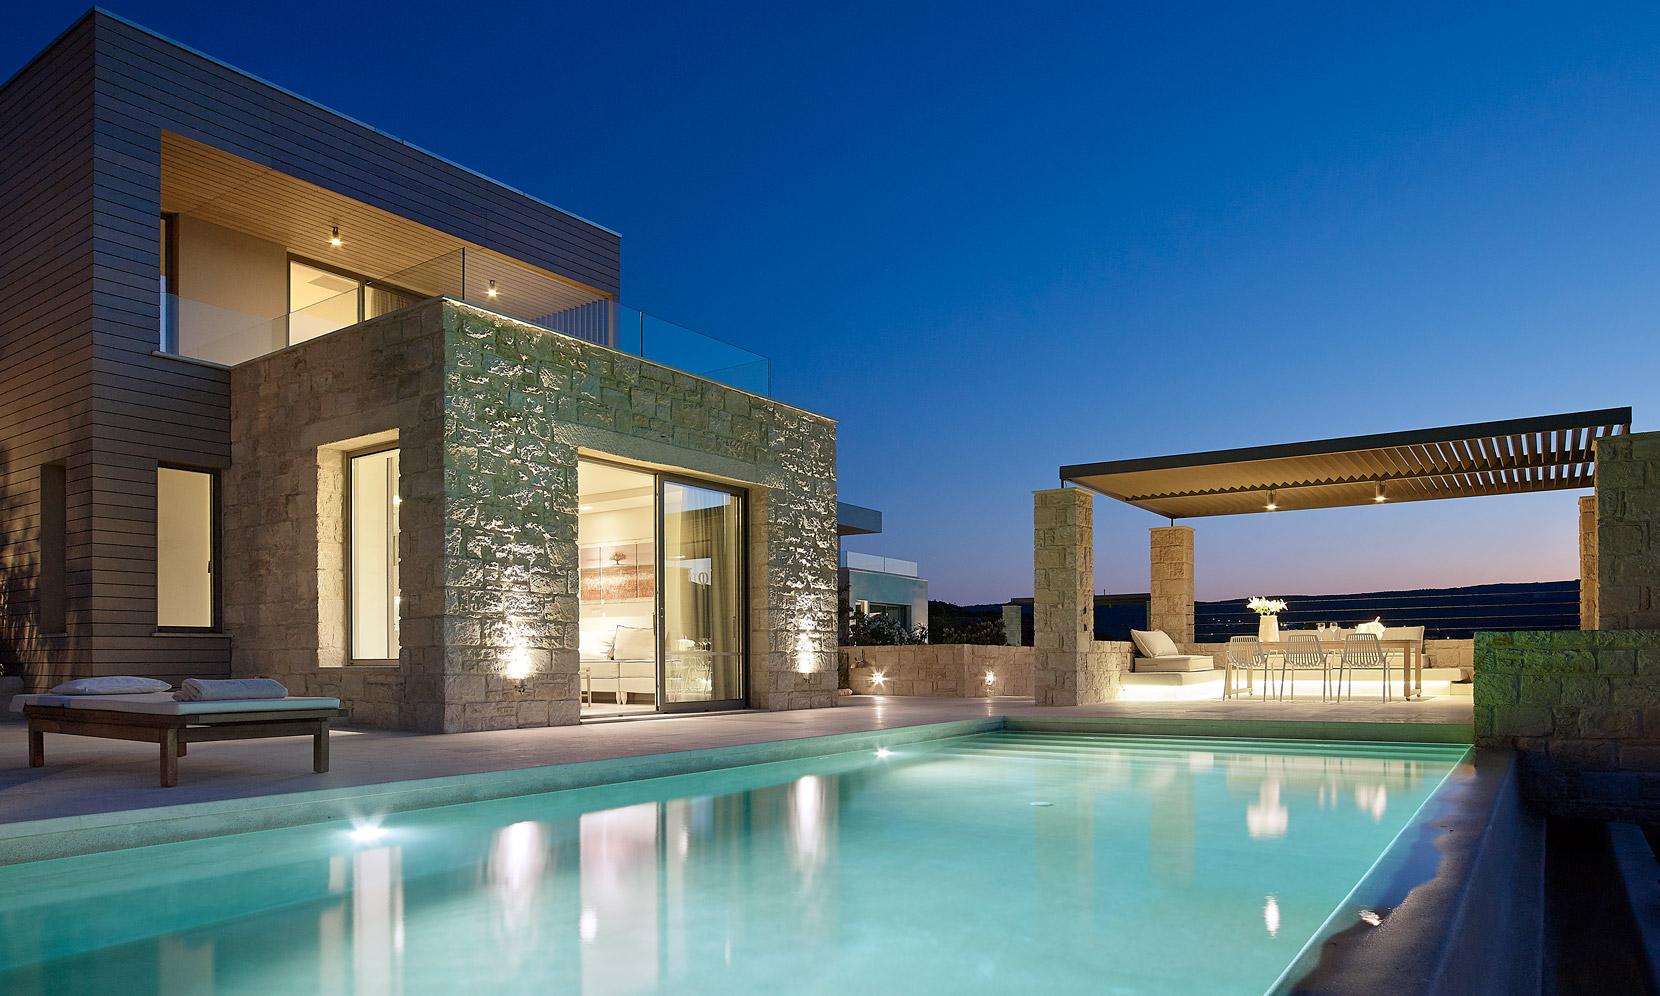 Crete Villa Mandarin jumbotron image